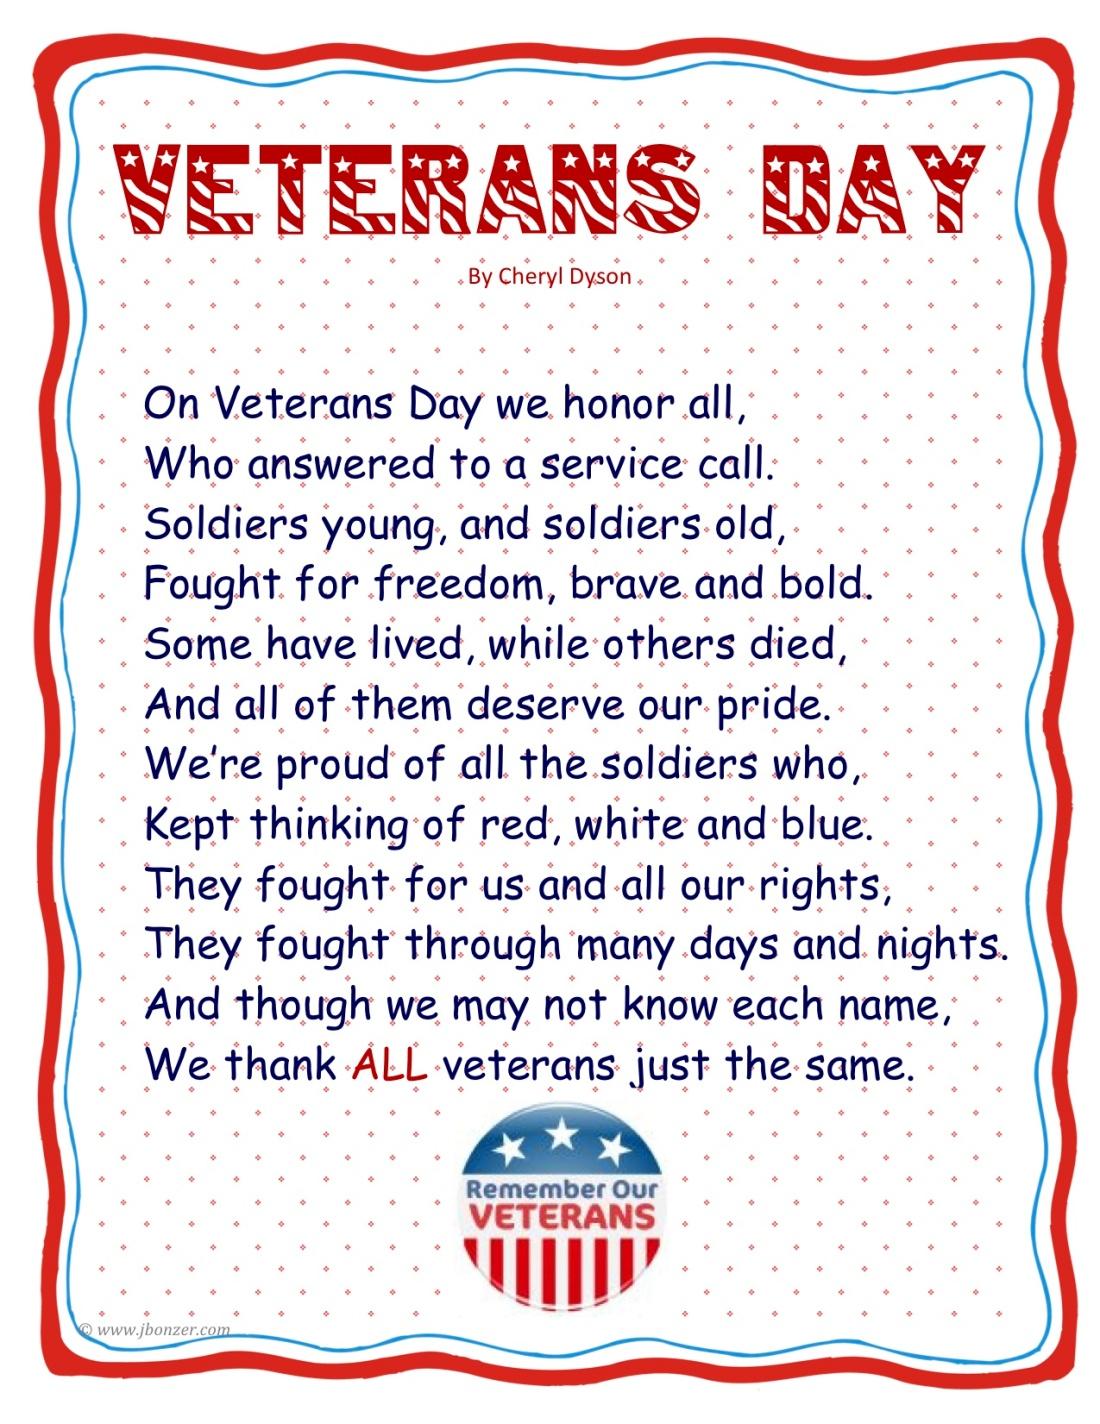 VeteransDayPoembyjudybonzer